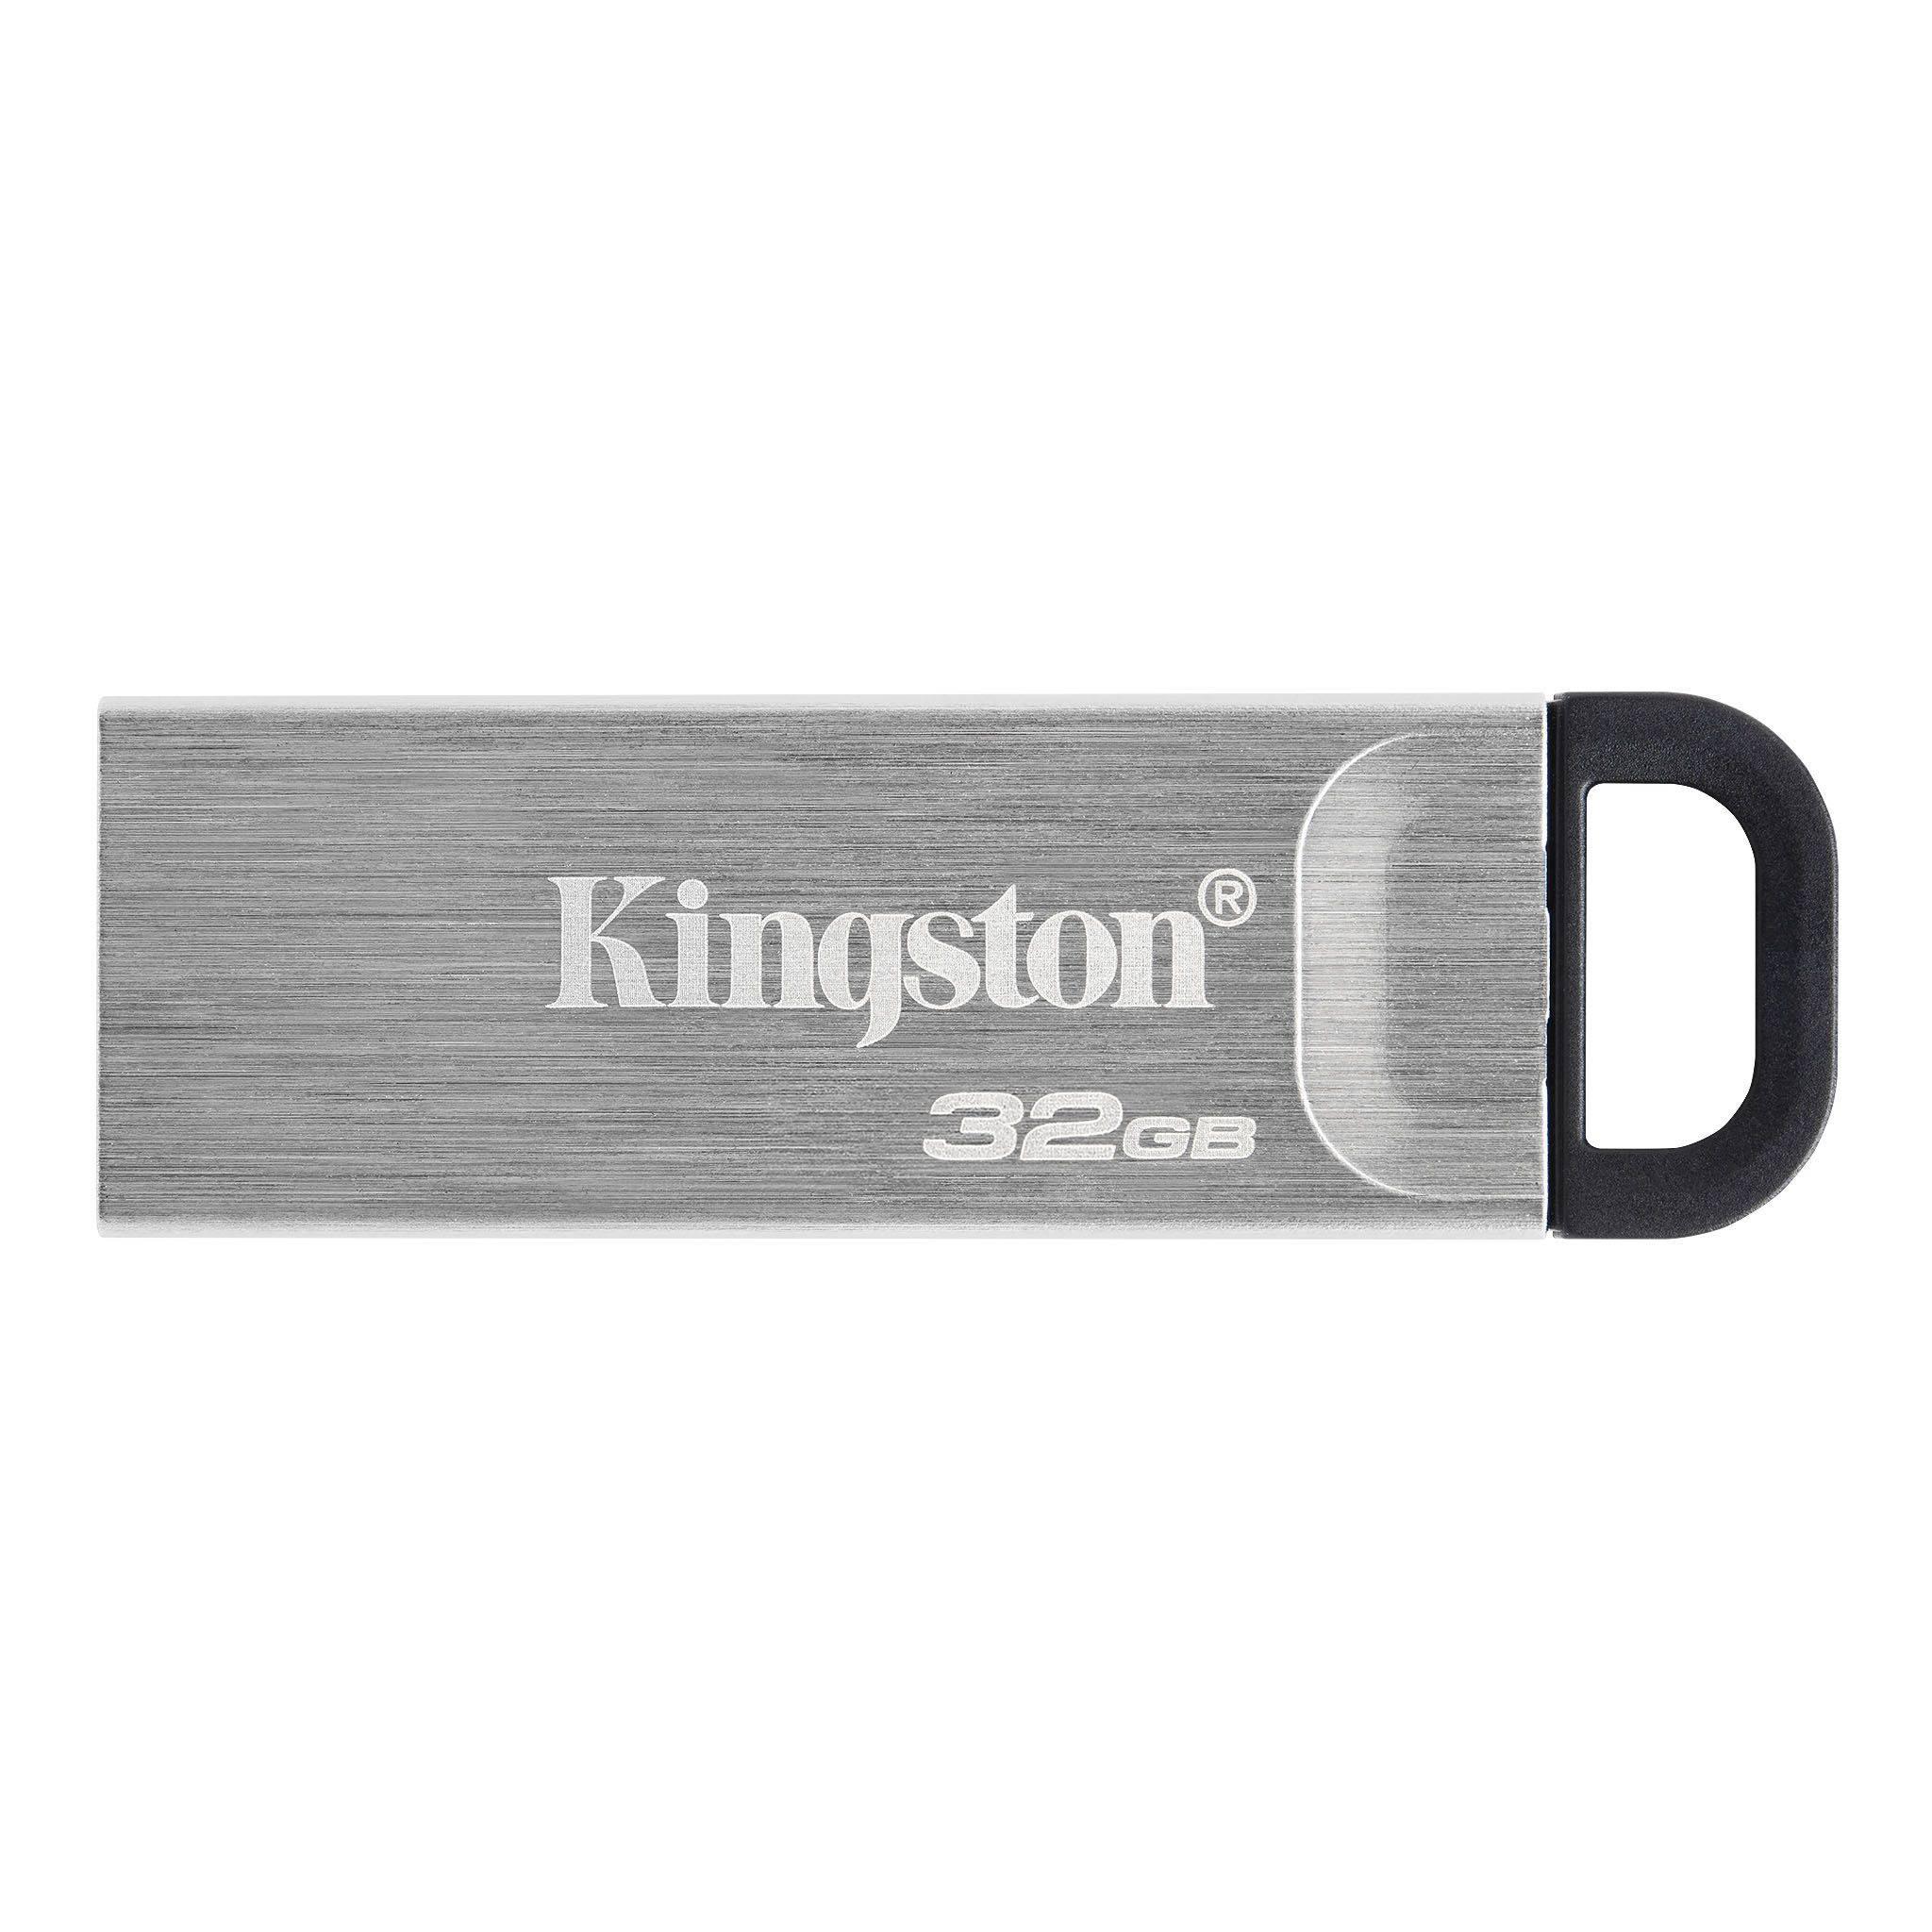 32GB Kingston USB 3.2 (gen 1) DT Kyson